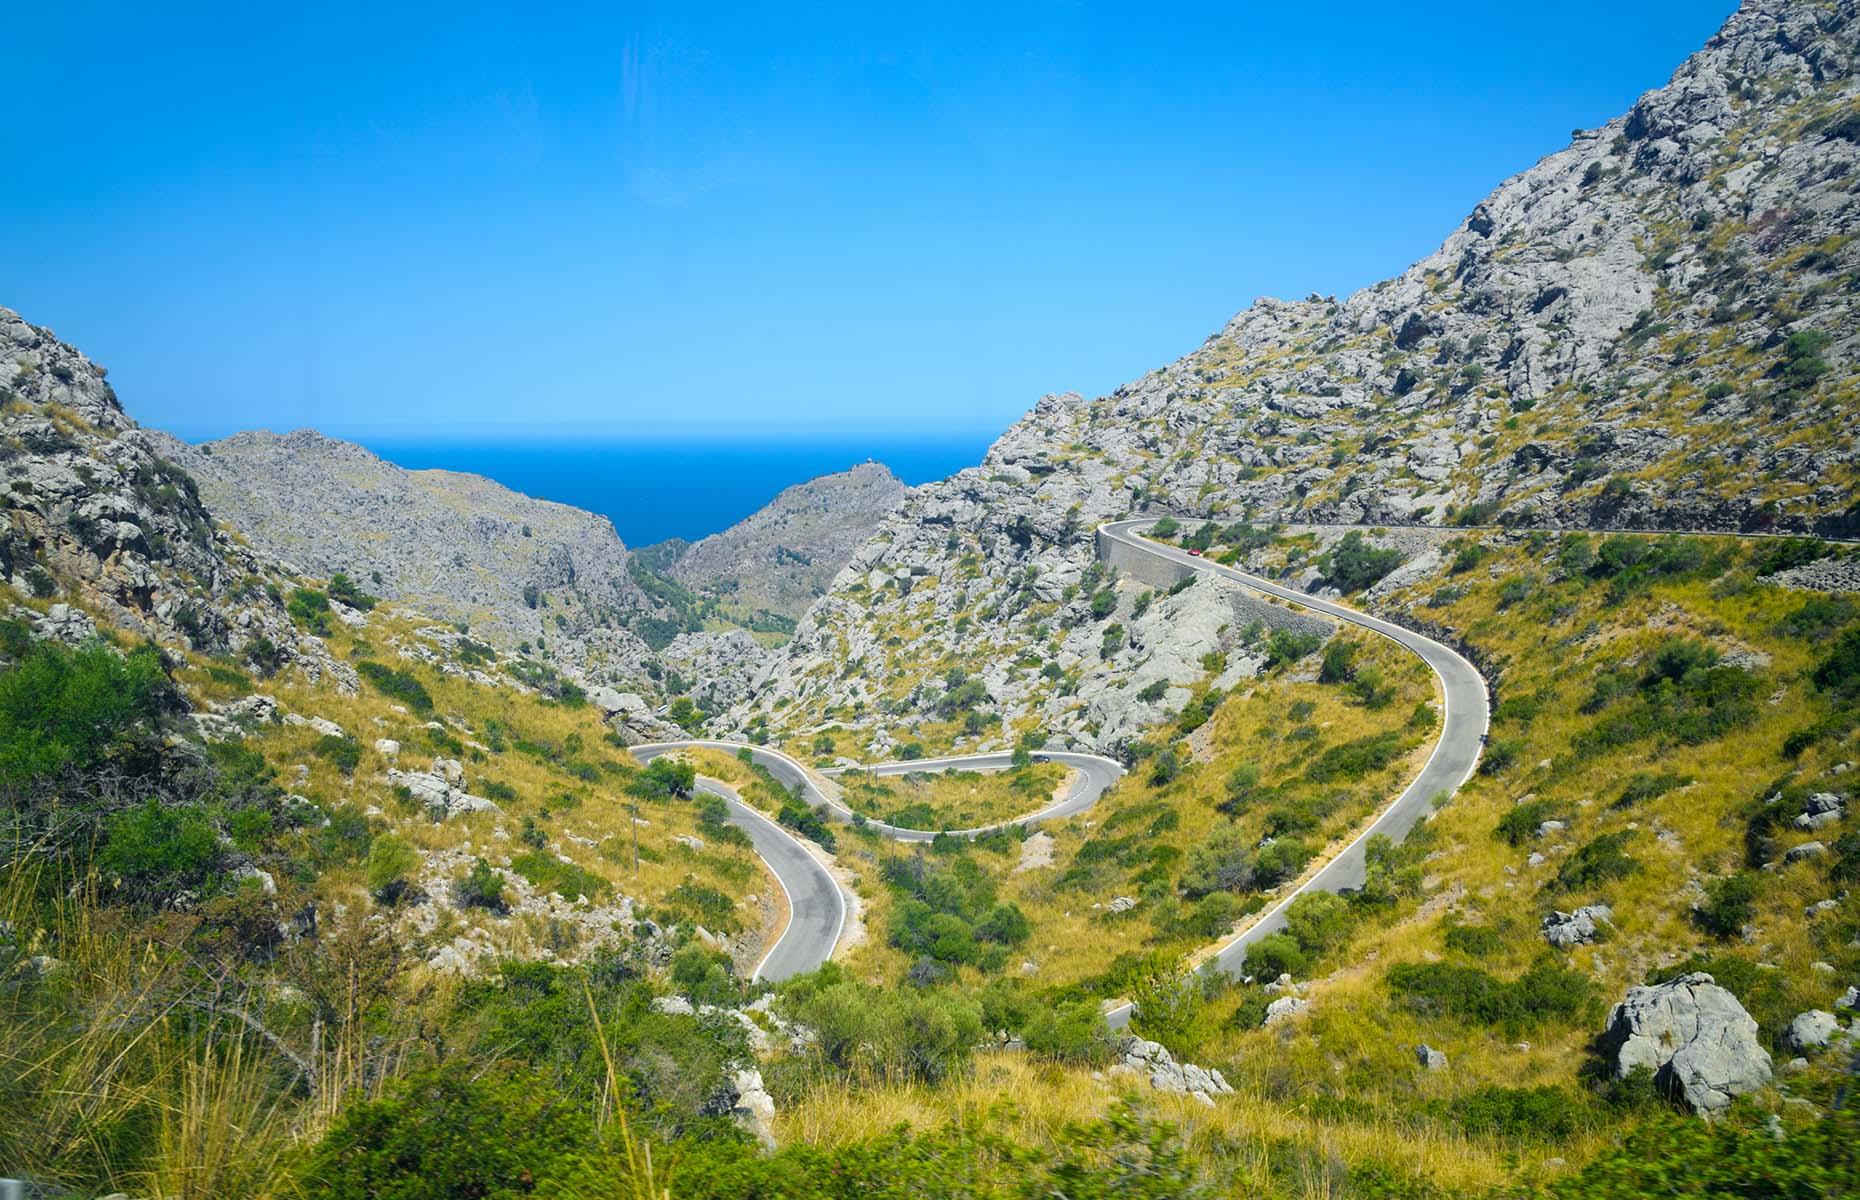 Serra de Tramuntana route MA-10 in Mallorca (Image: Andrew Buckin/Shutterstock)